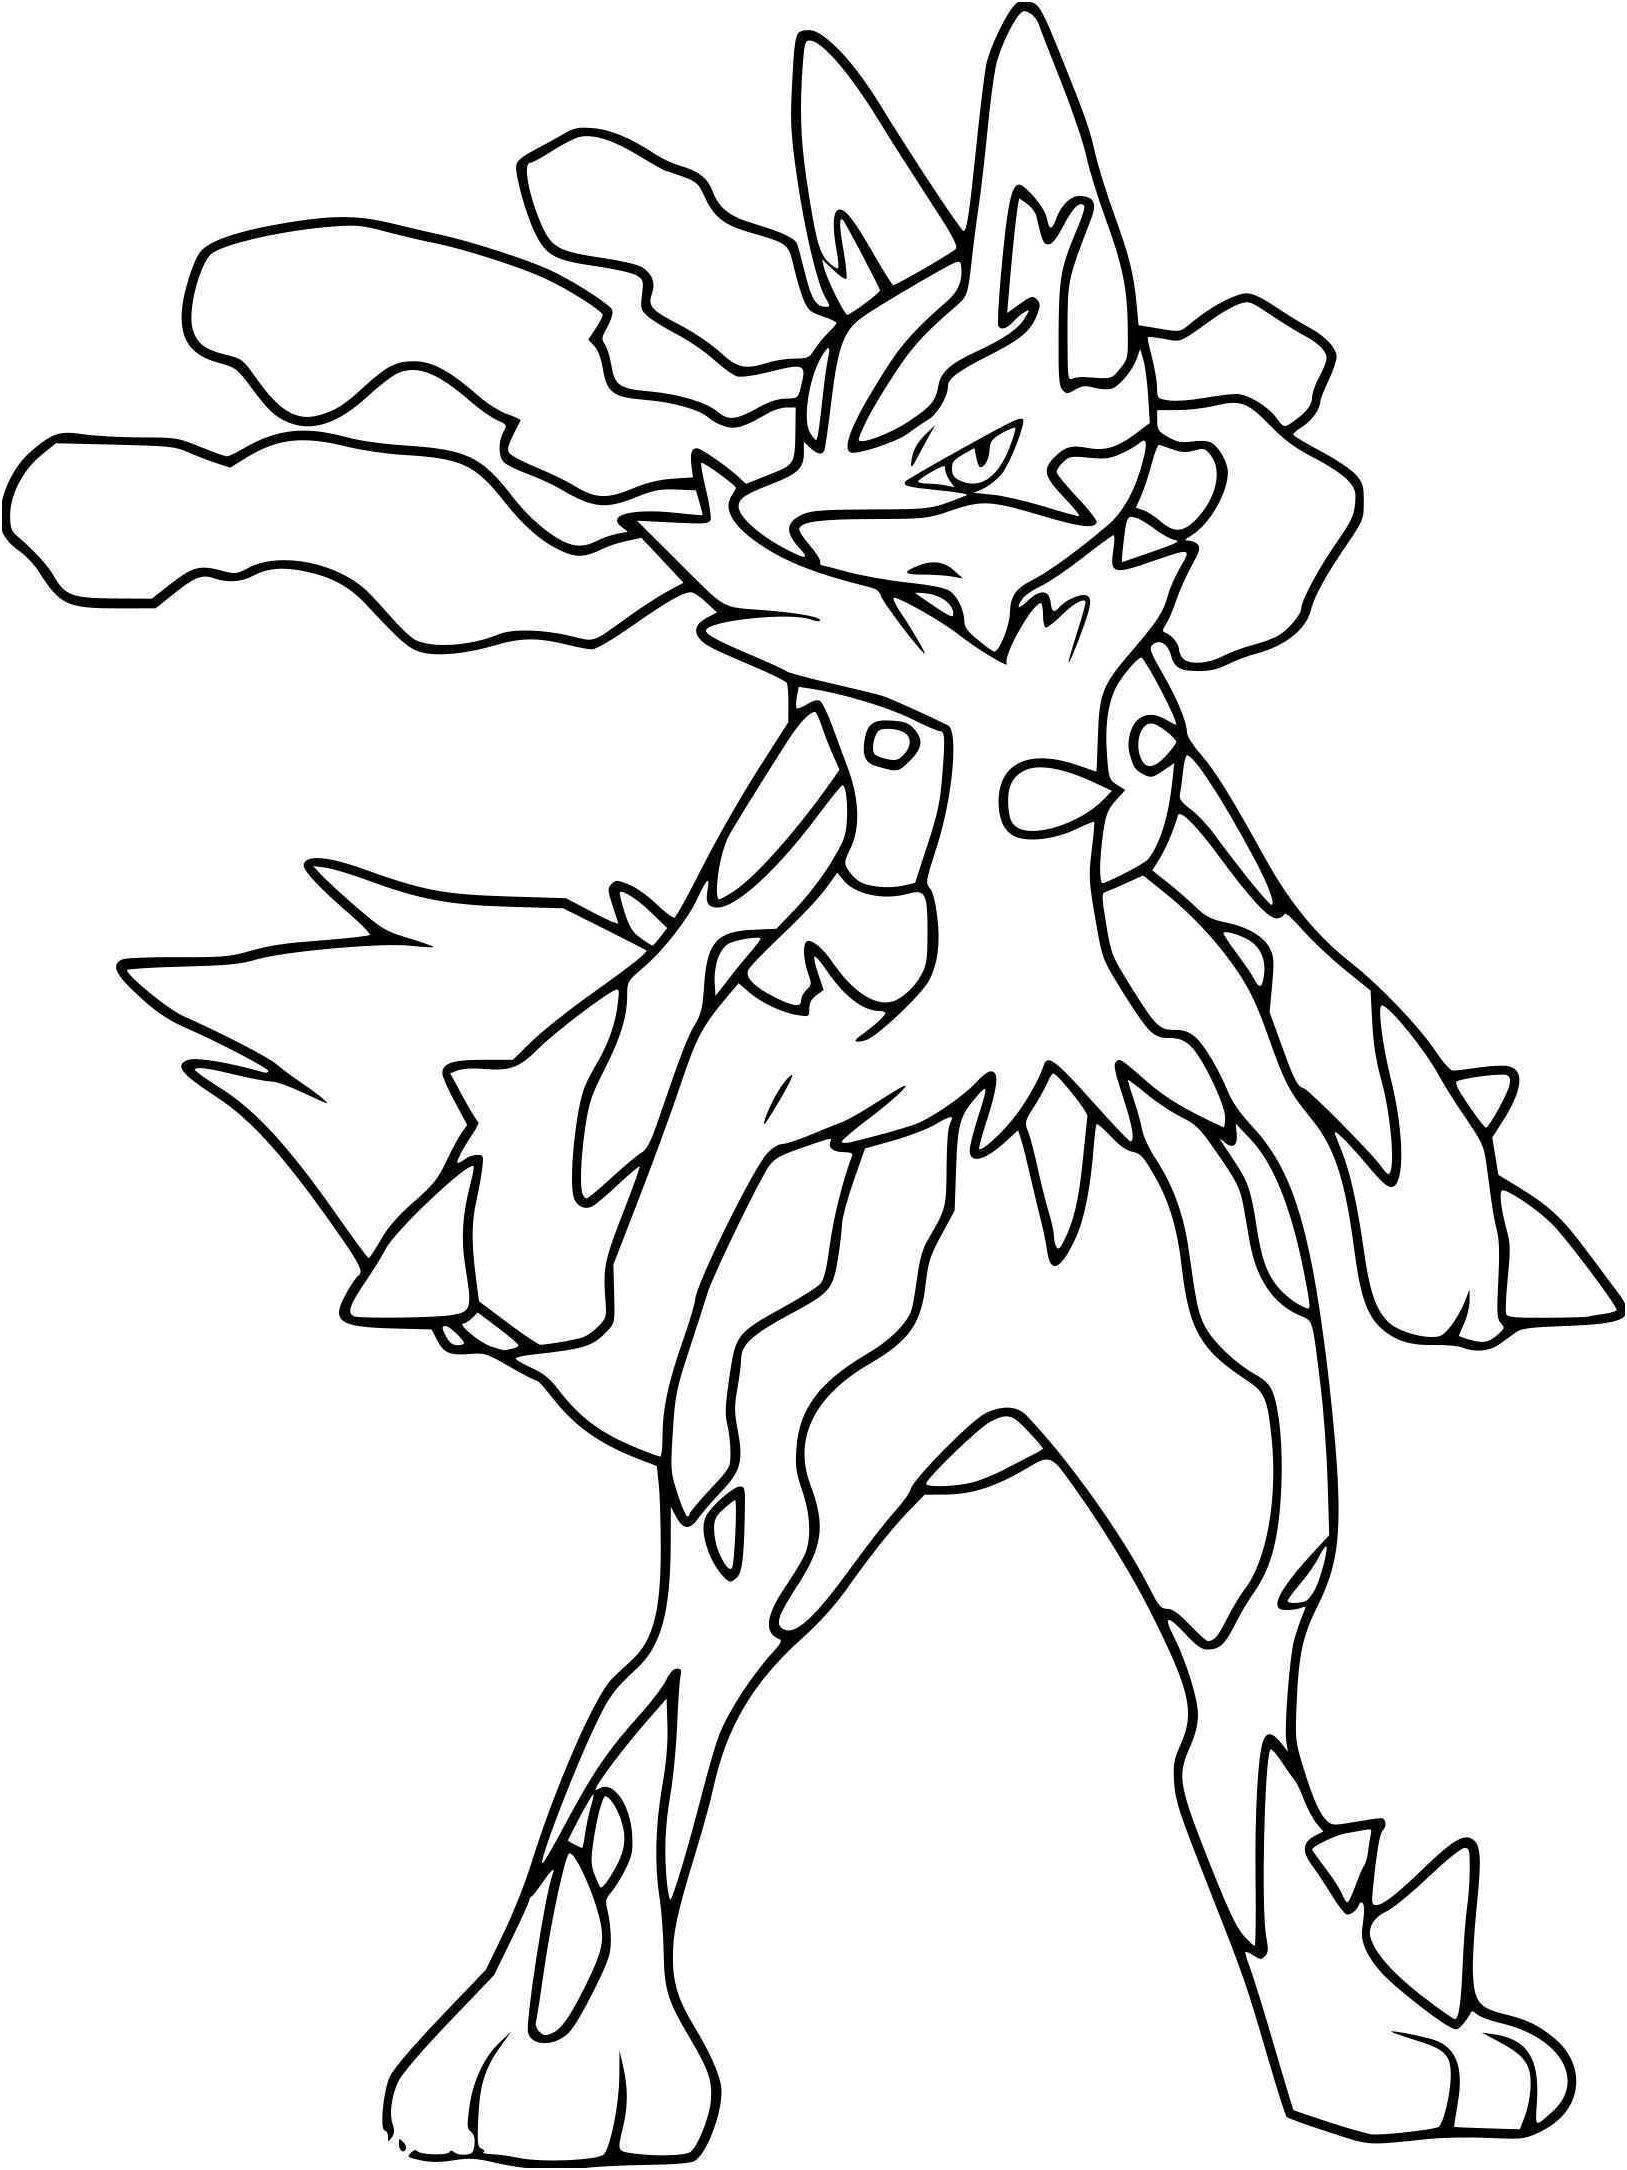 Coloriage Pokemon Lucario Coloriage Pokemon Lucario